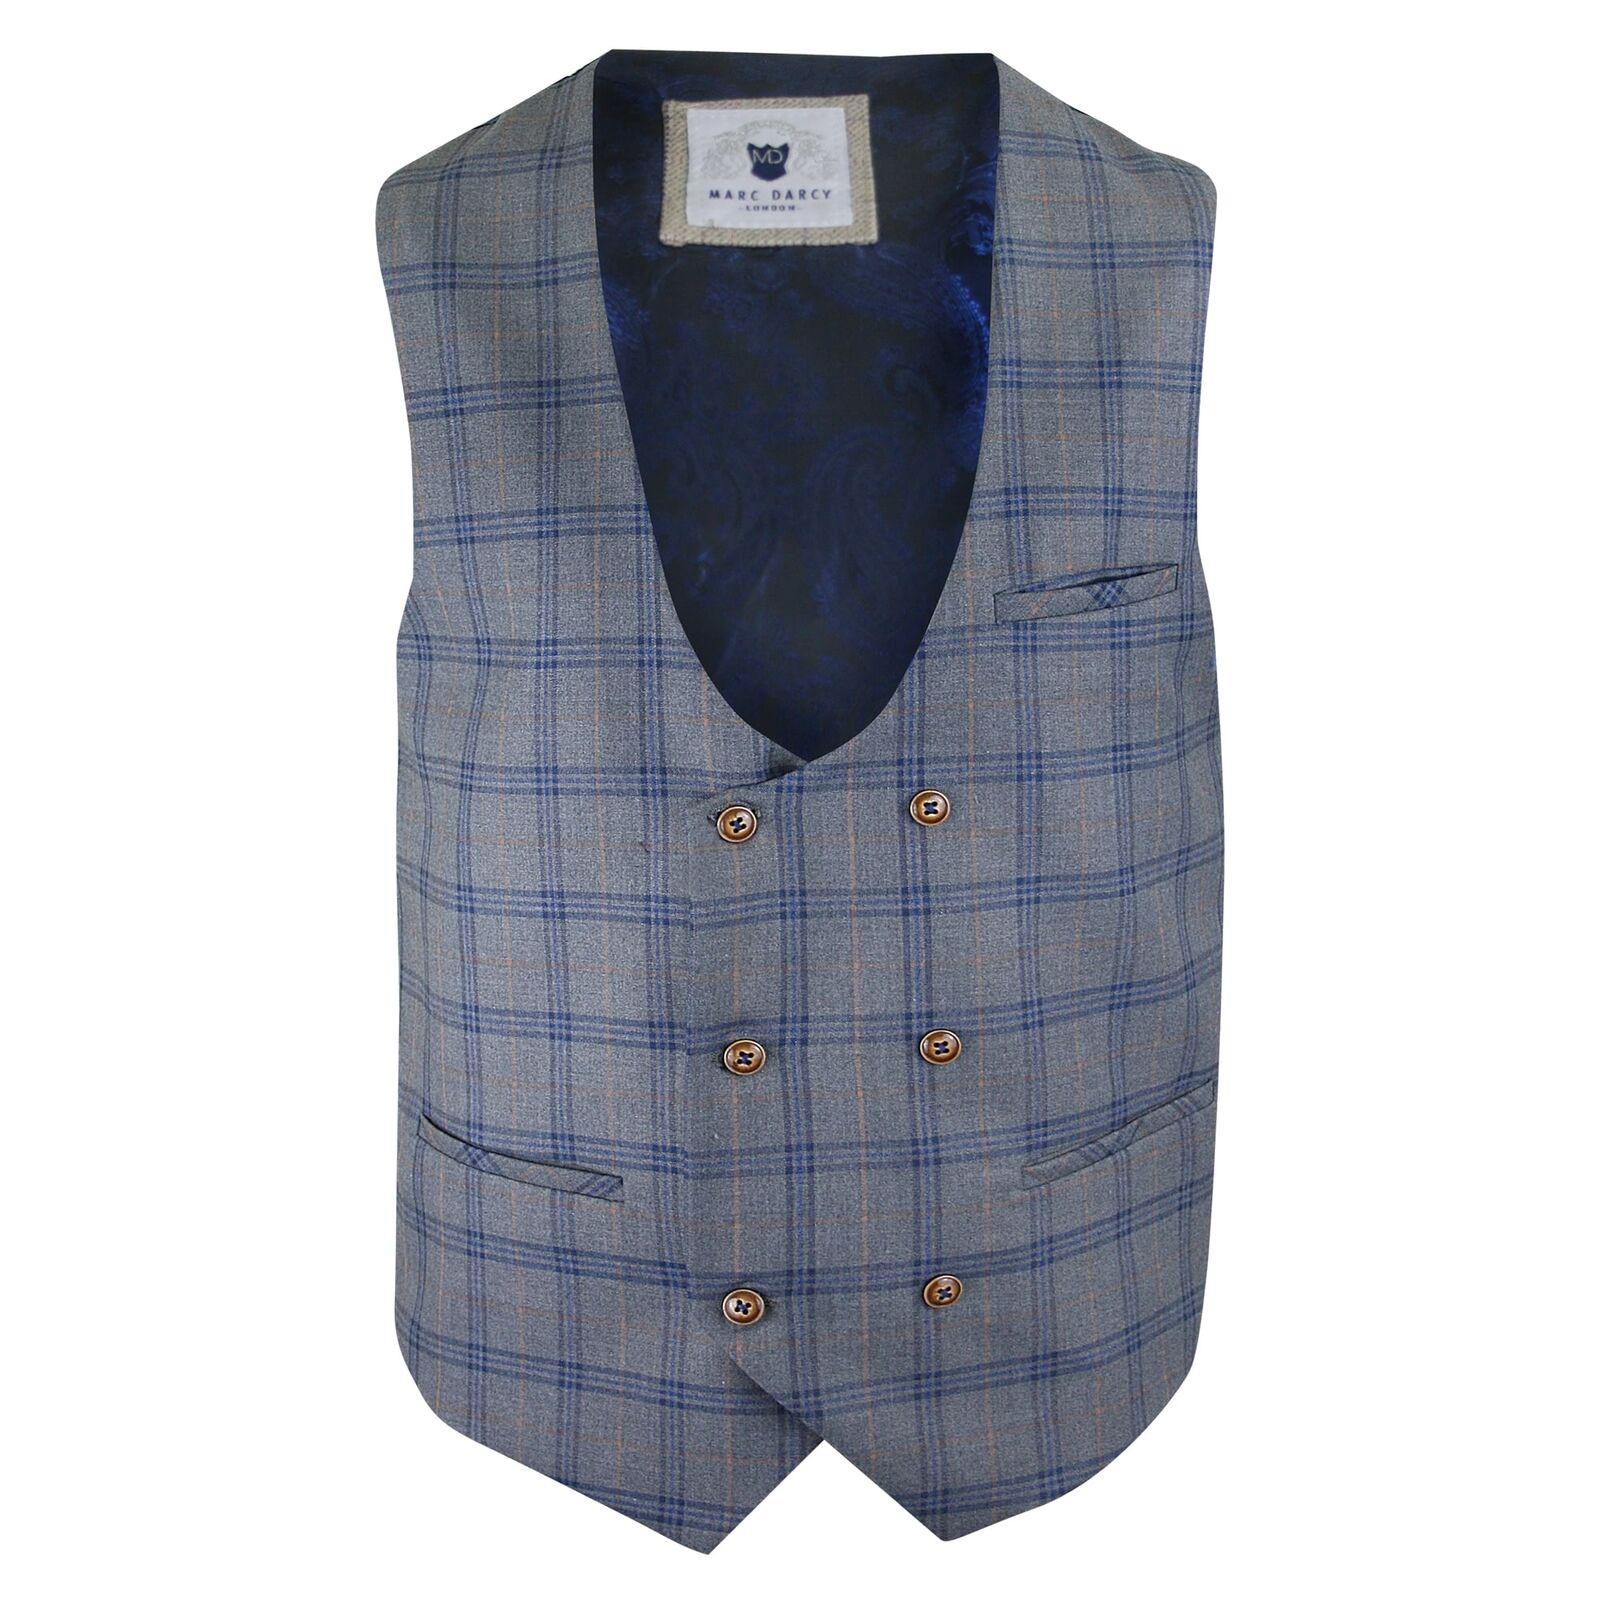 Marc Darcy Logan bluee Waist Coat